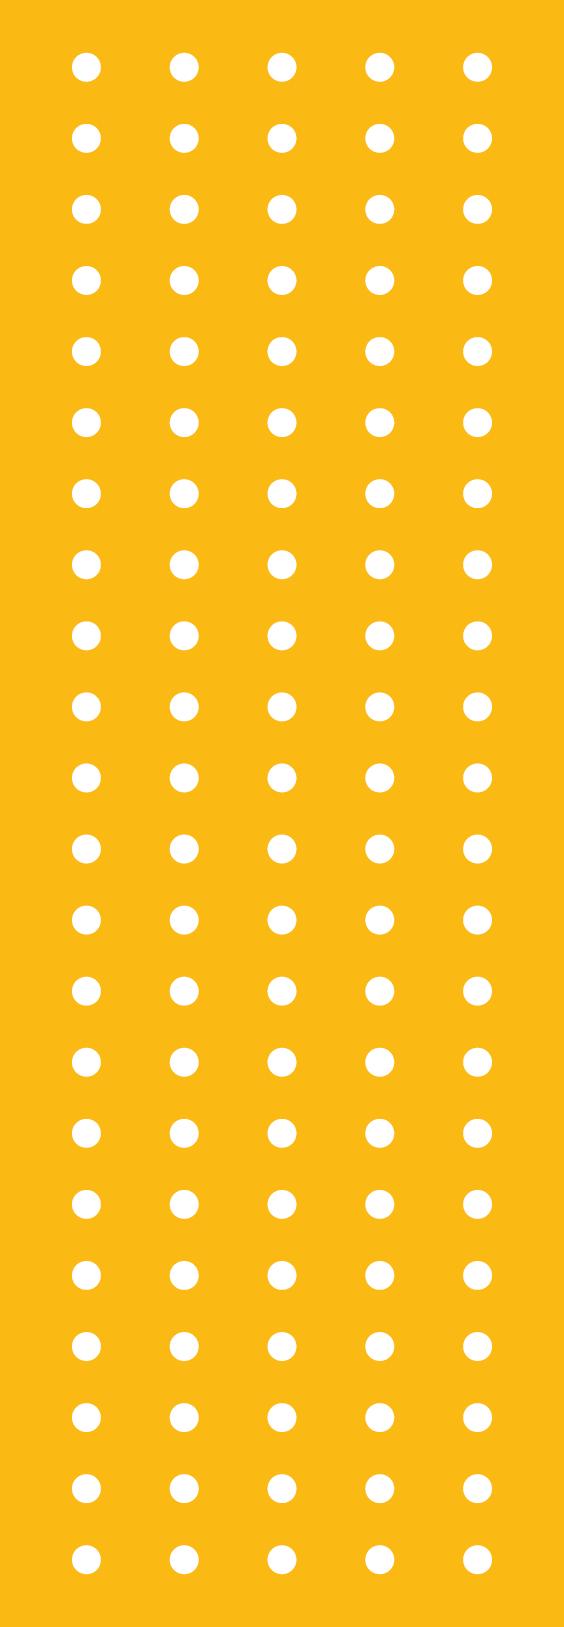 base_amarelo2.png